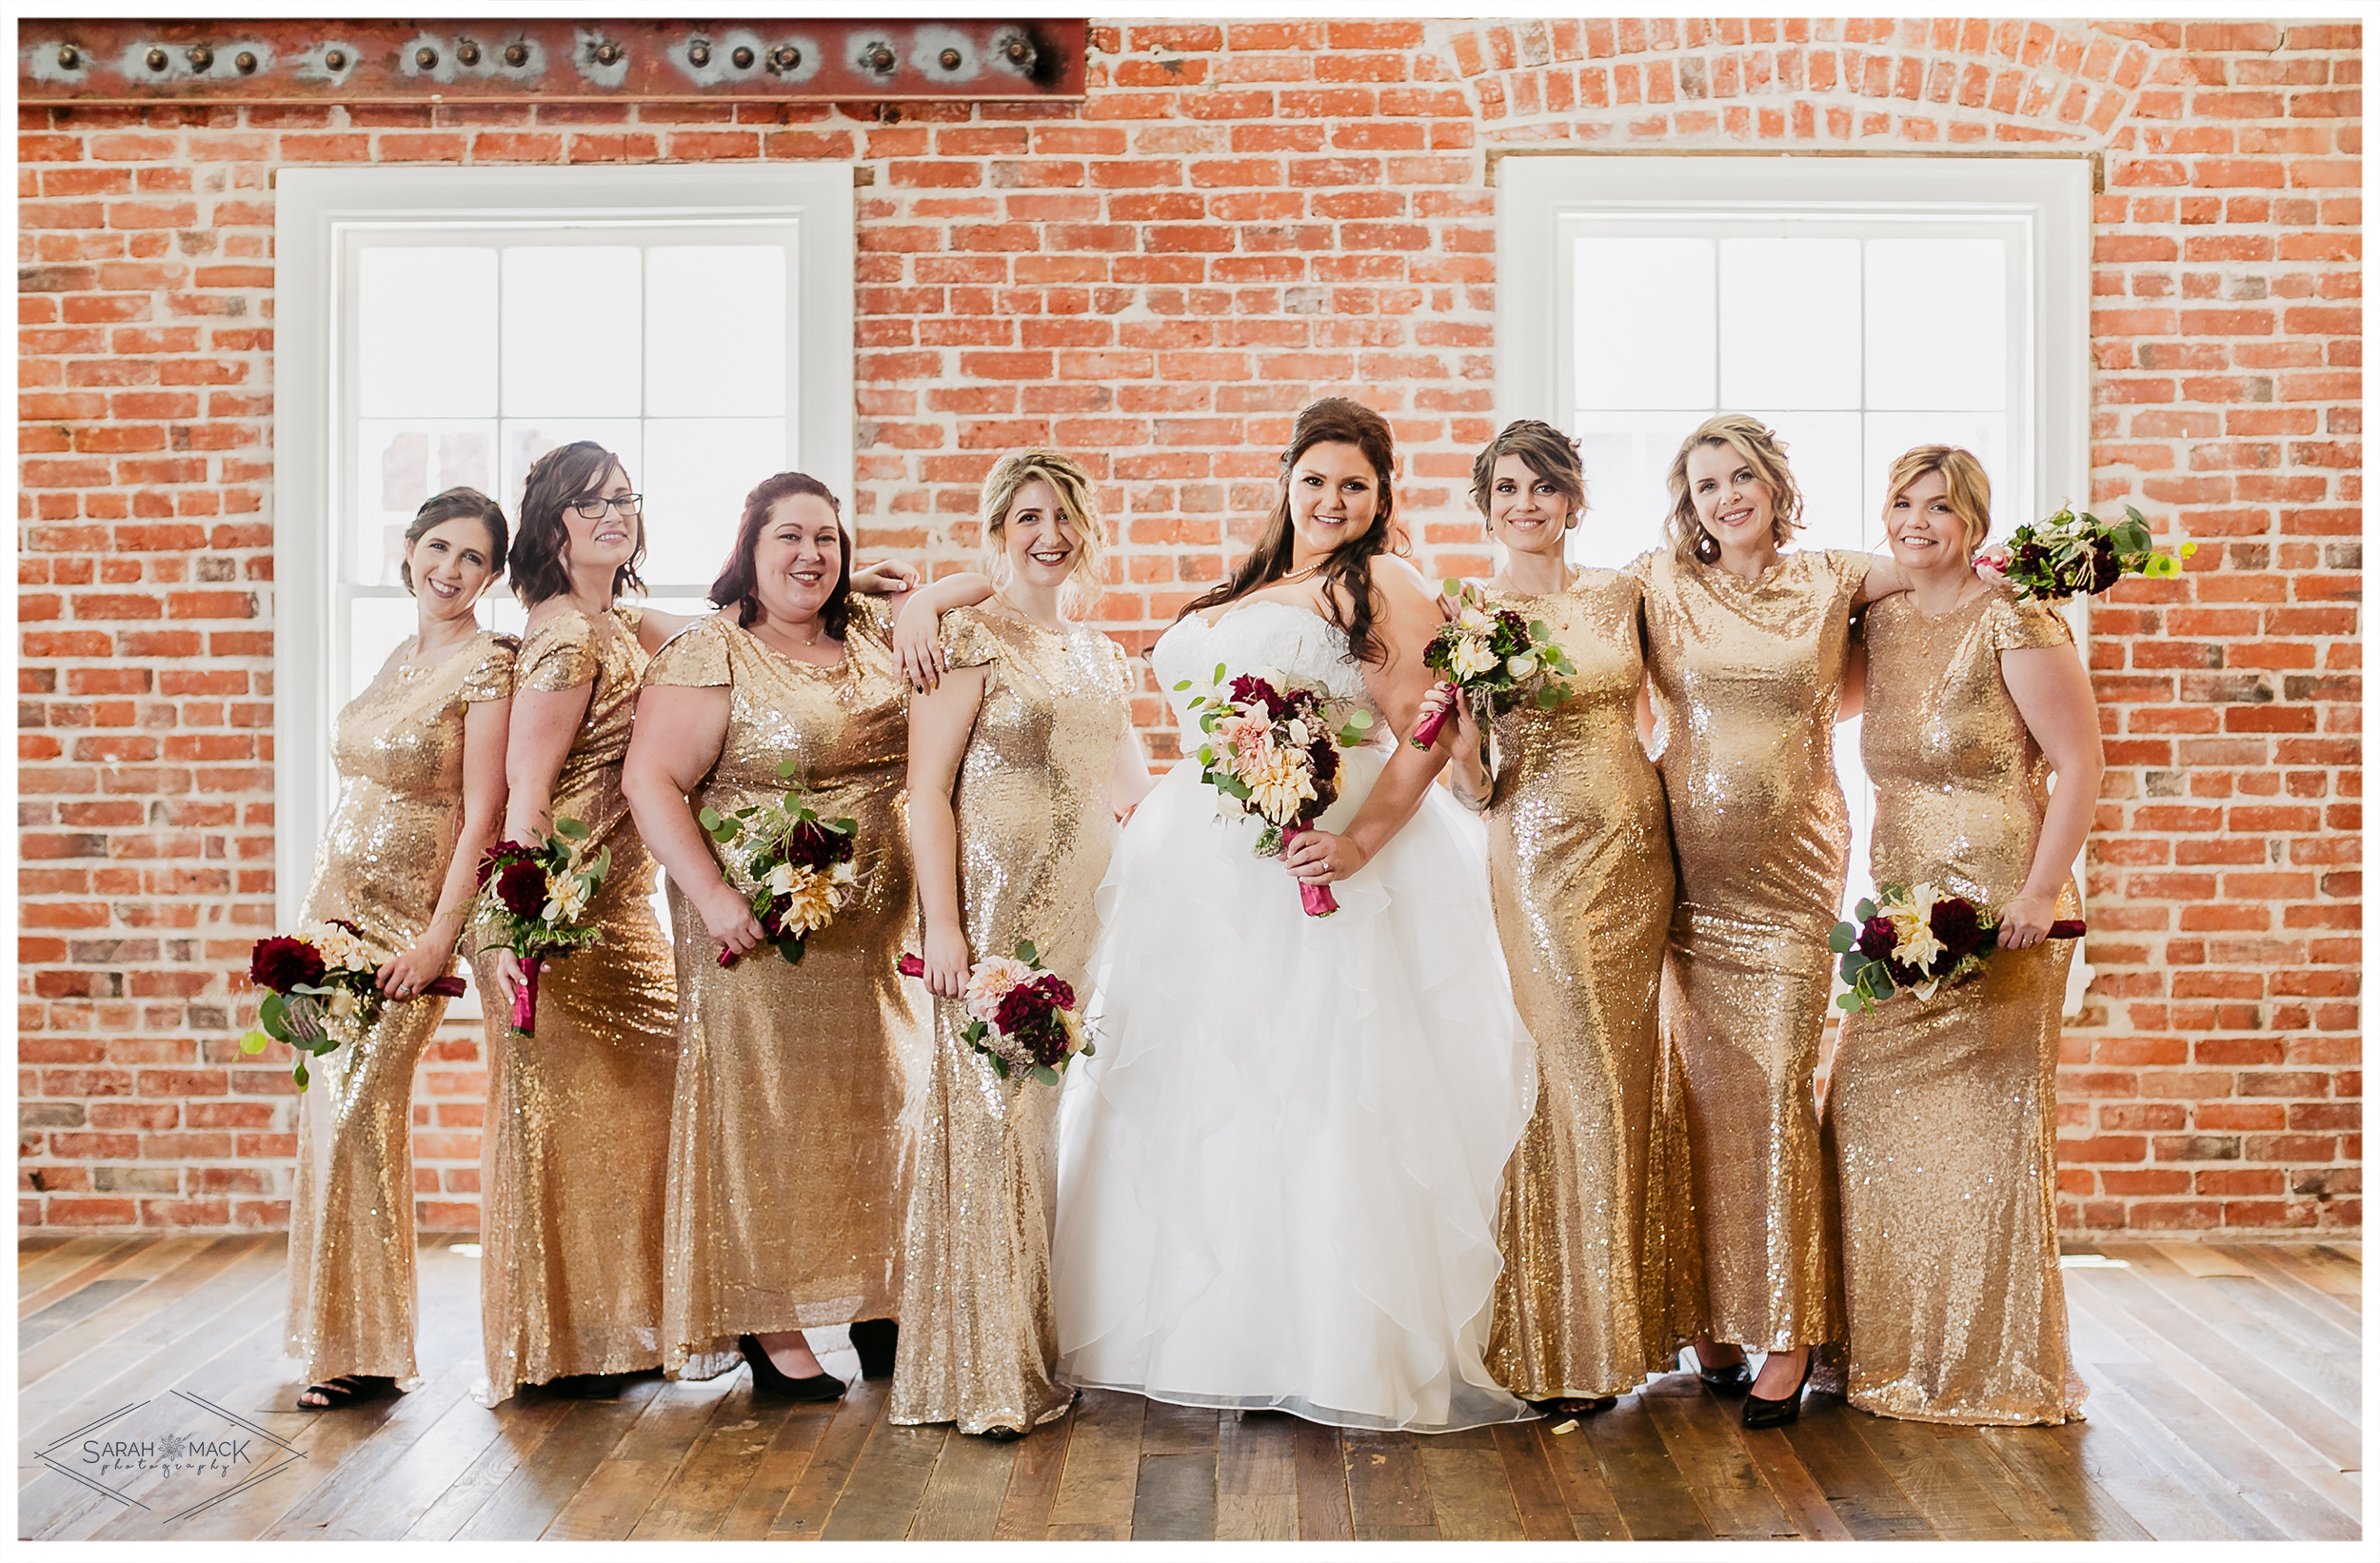 RF-Estate-on-Second-Santa-Ana-Wedding-Photography-19.jpg